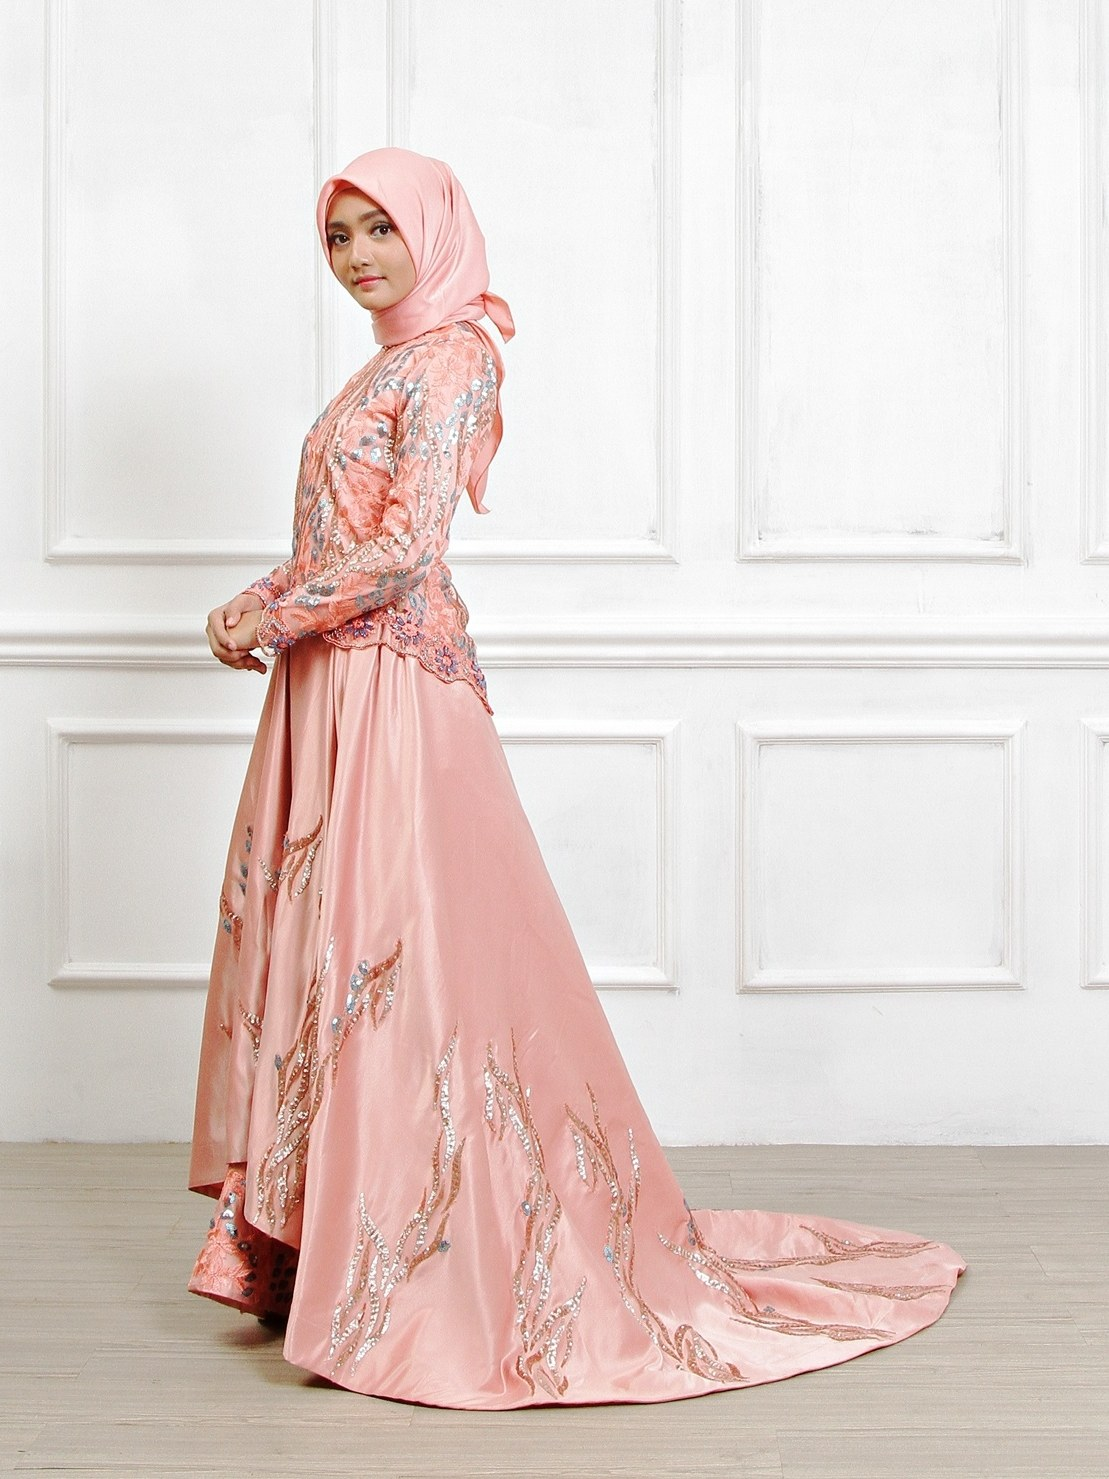 Bentuk Sewa Gaun Pengantin Muslimah Di solo Txdf Gaun Pengantin Muslimah Dress Muslim Pungky Rumah Jahit